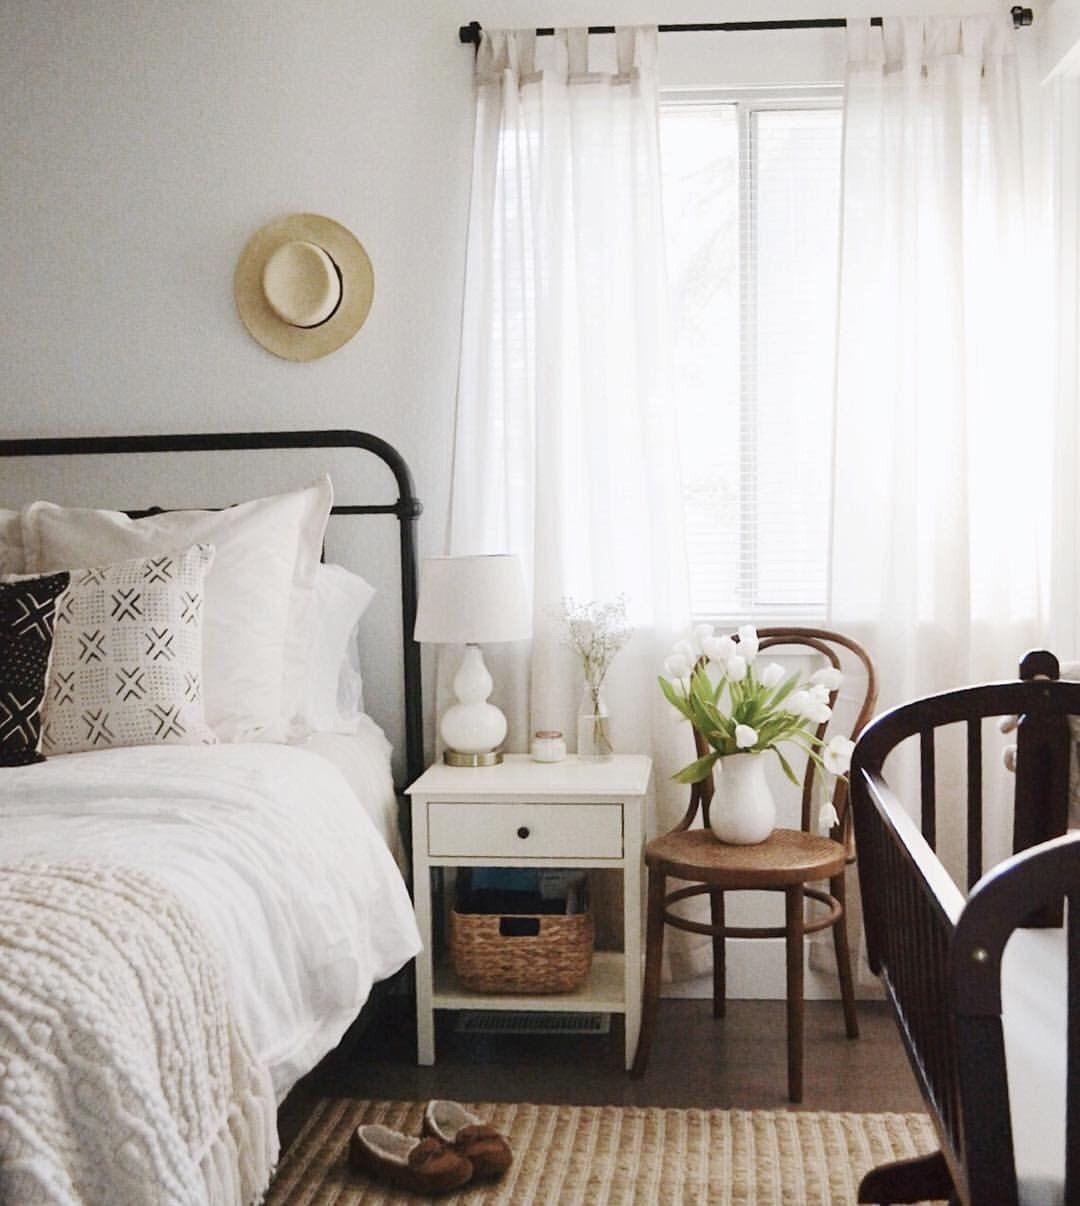 Vintage master bedroom decor  oldfarmhouse ucpinRIzOYQ ud  dwell  Pinterest